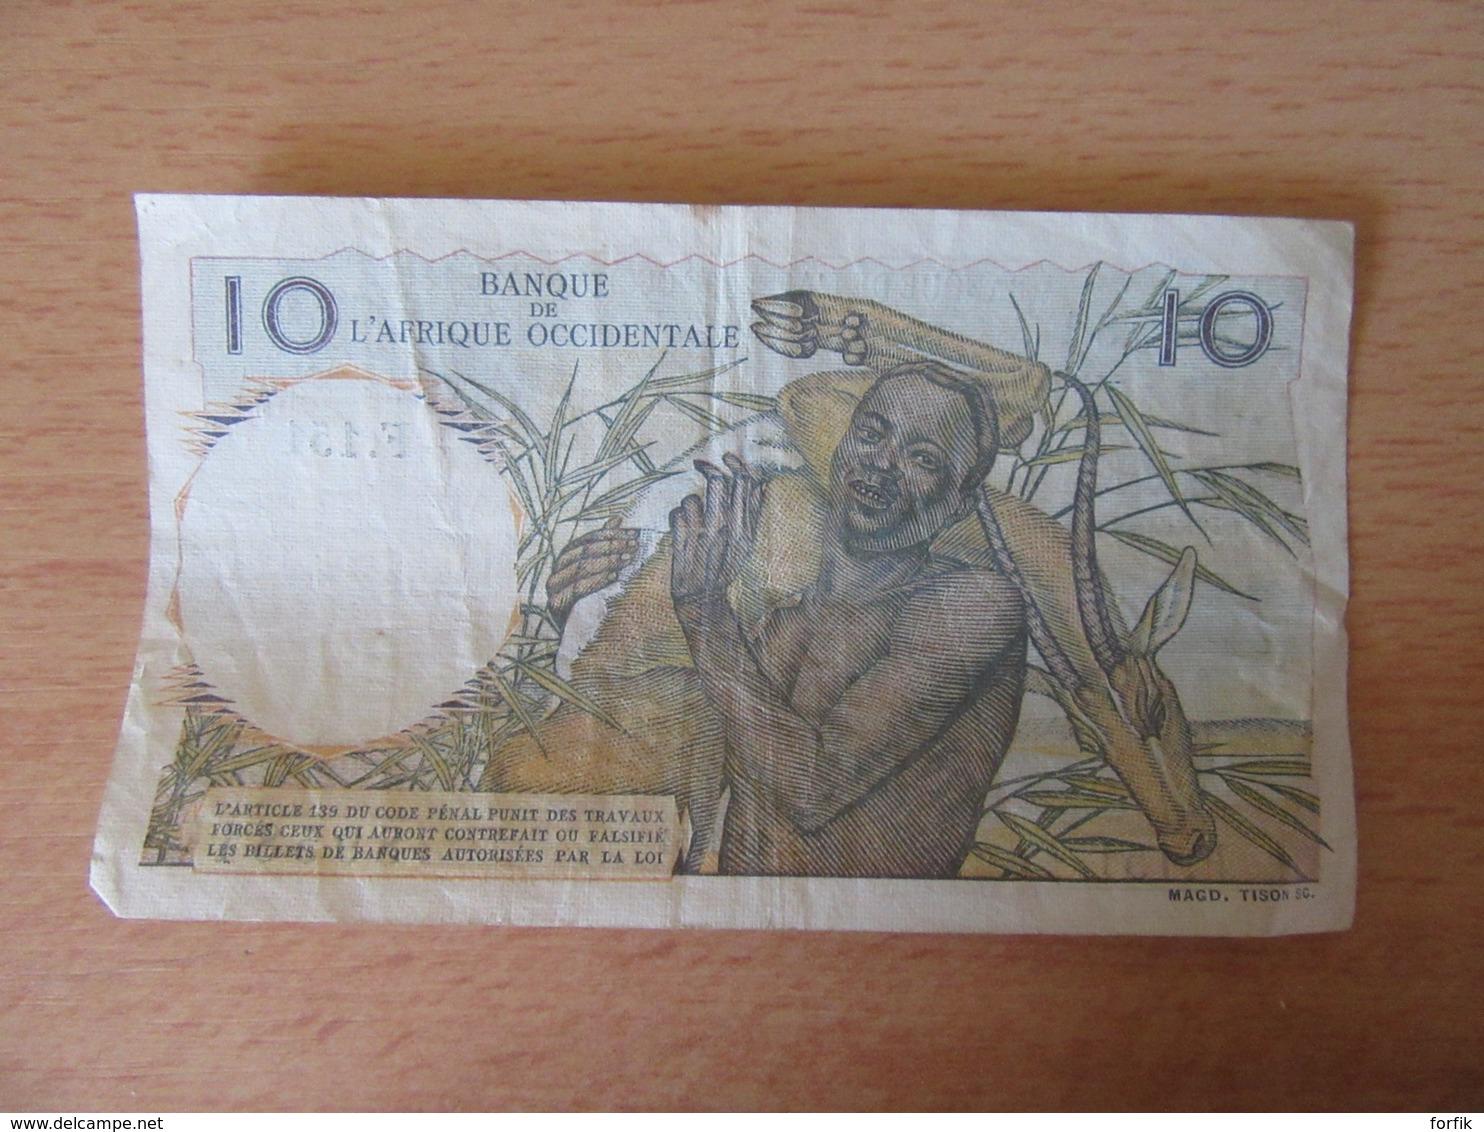 Banque De L'Afrique Occidentale - Billet 10 Francs 28-10-1954 - Alphabet F.151 / 89591 - West-Afrikaanse Staten